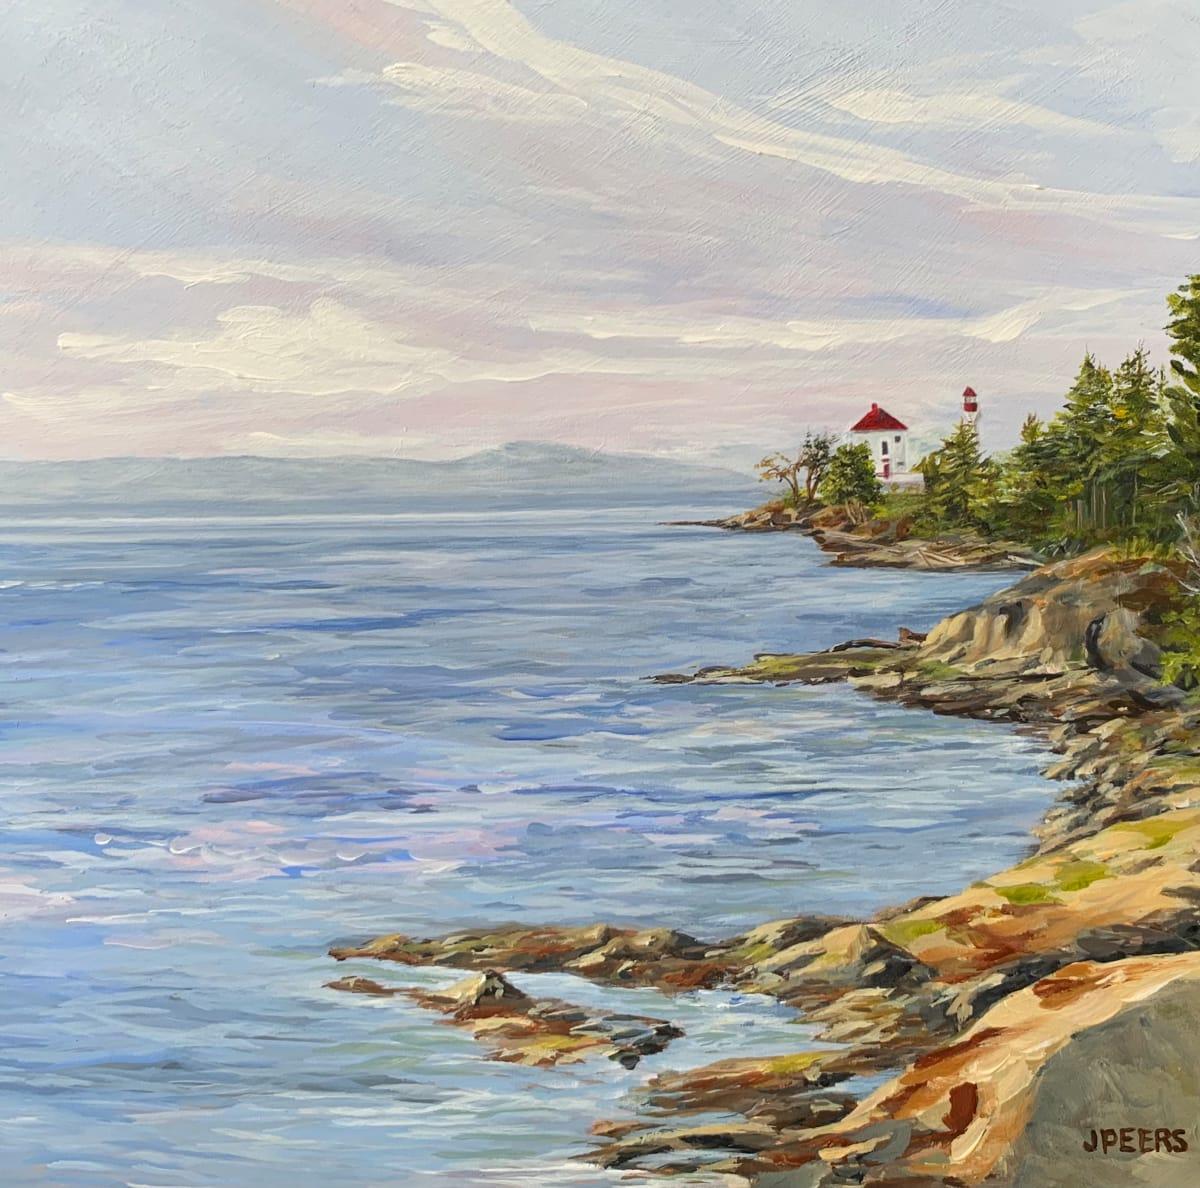 Rocky Shores by Jennifer Peers